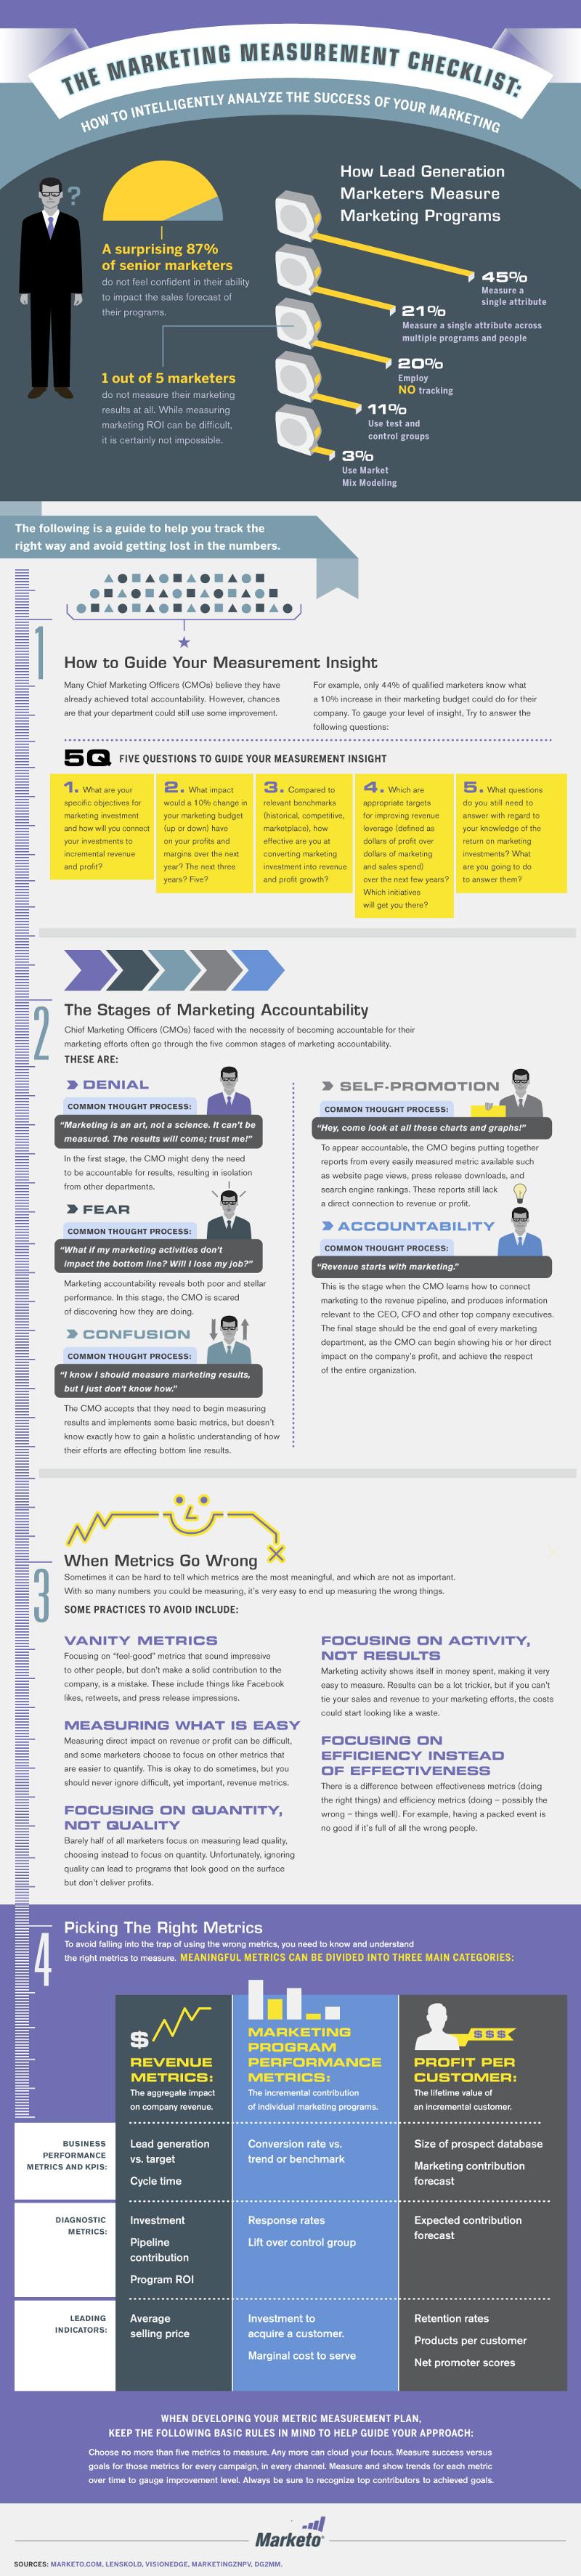 Marketing Performance Measurement Metrics, Examples and Methods